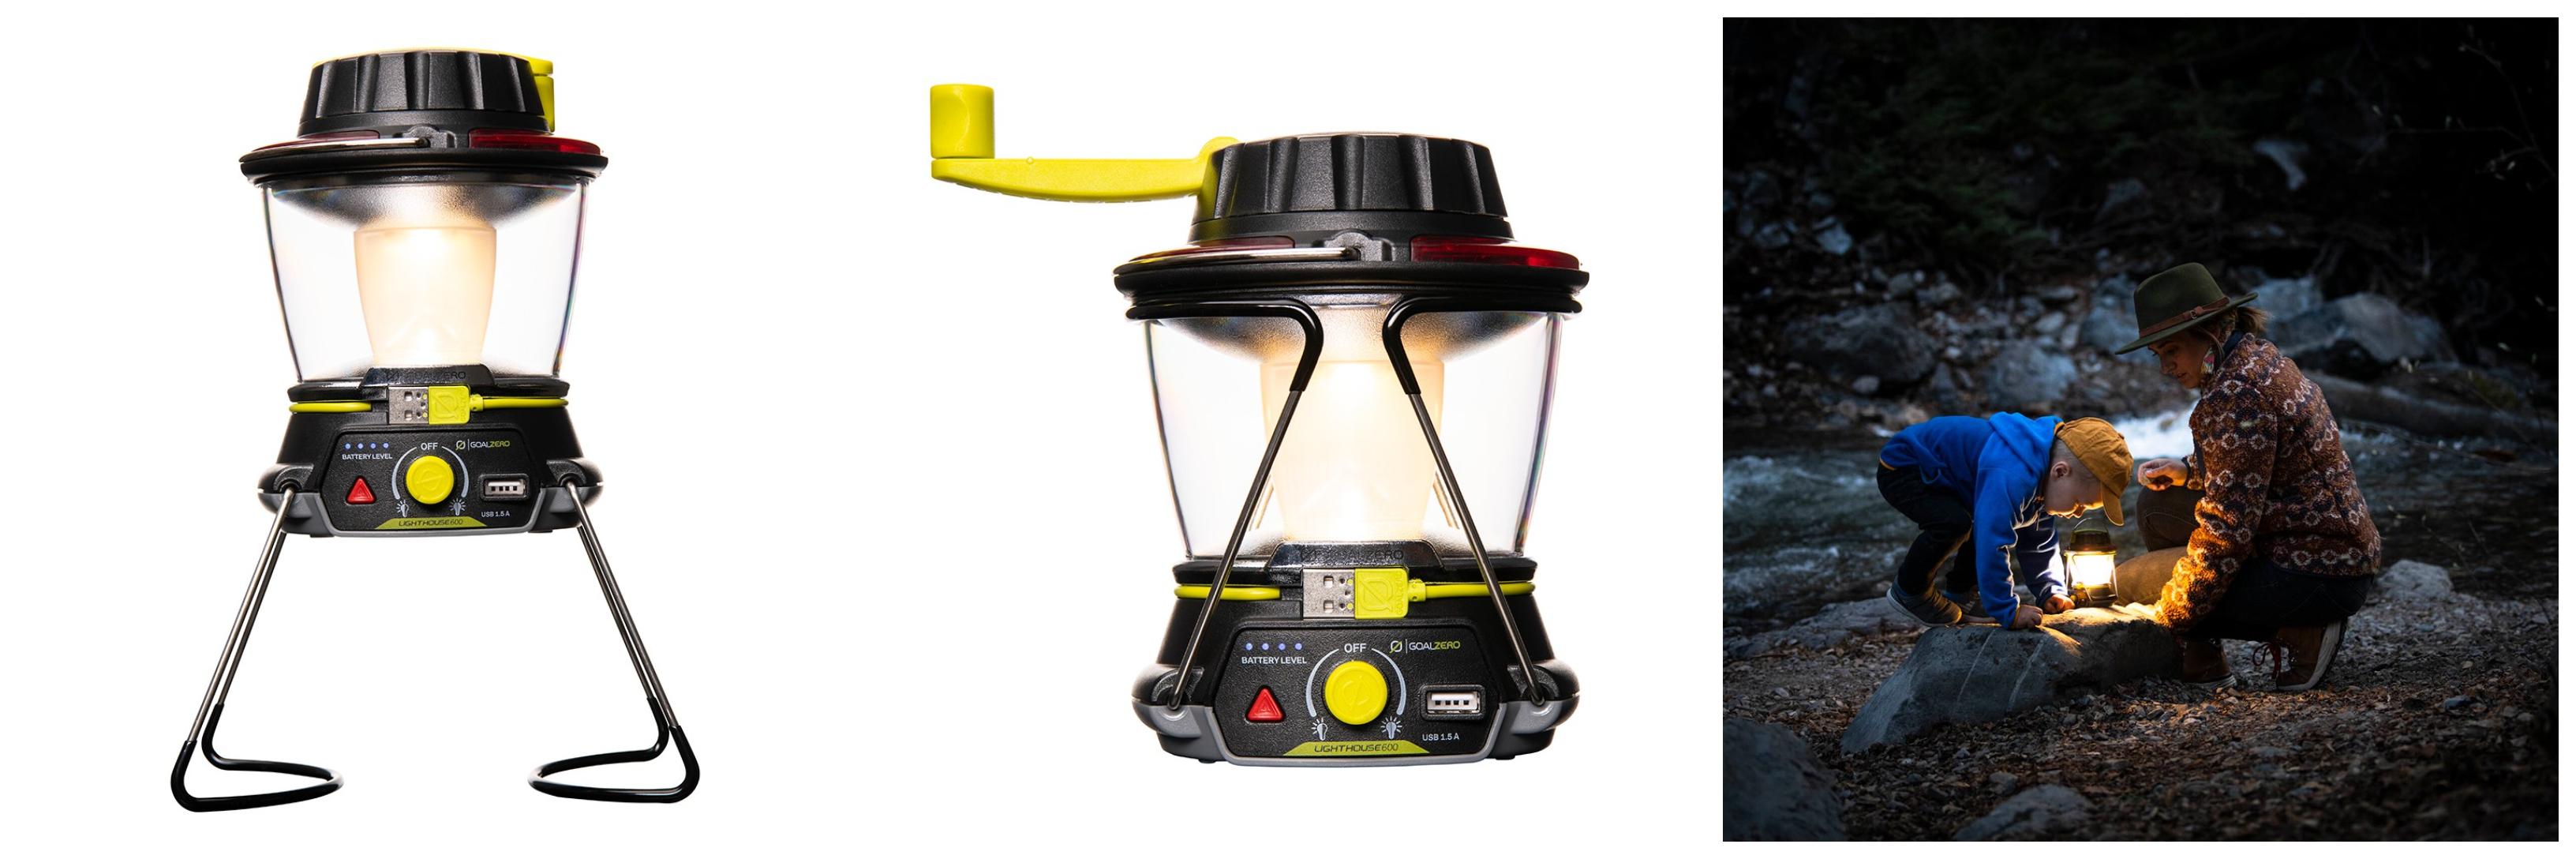 Goal Zero Lighthouse 600 Lantern and Portable USB Hub